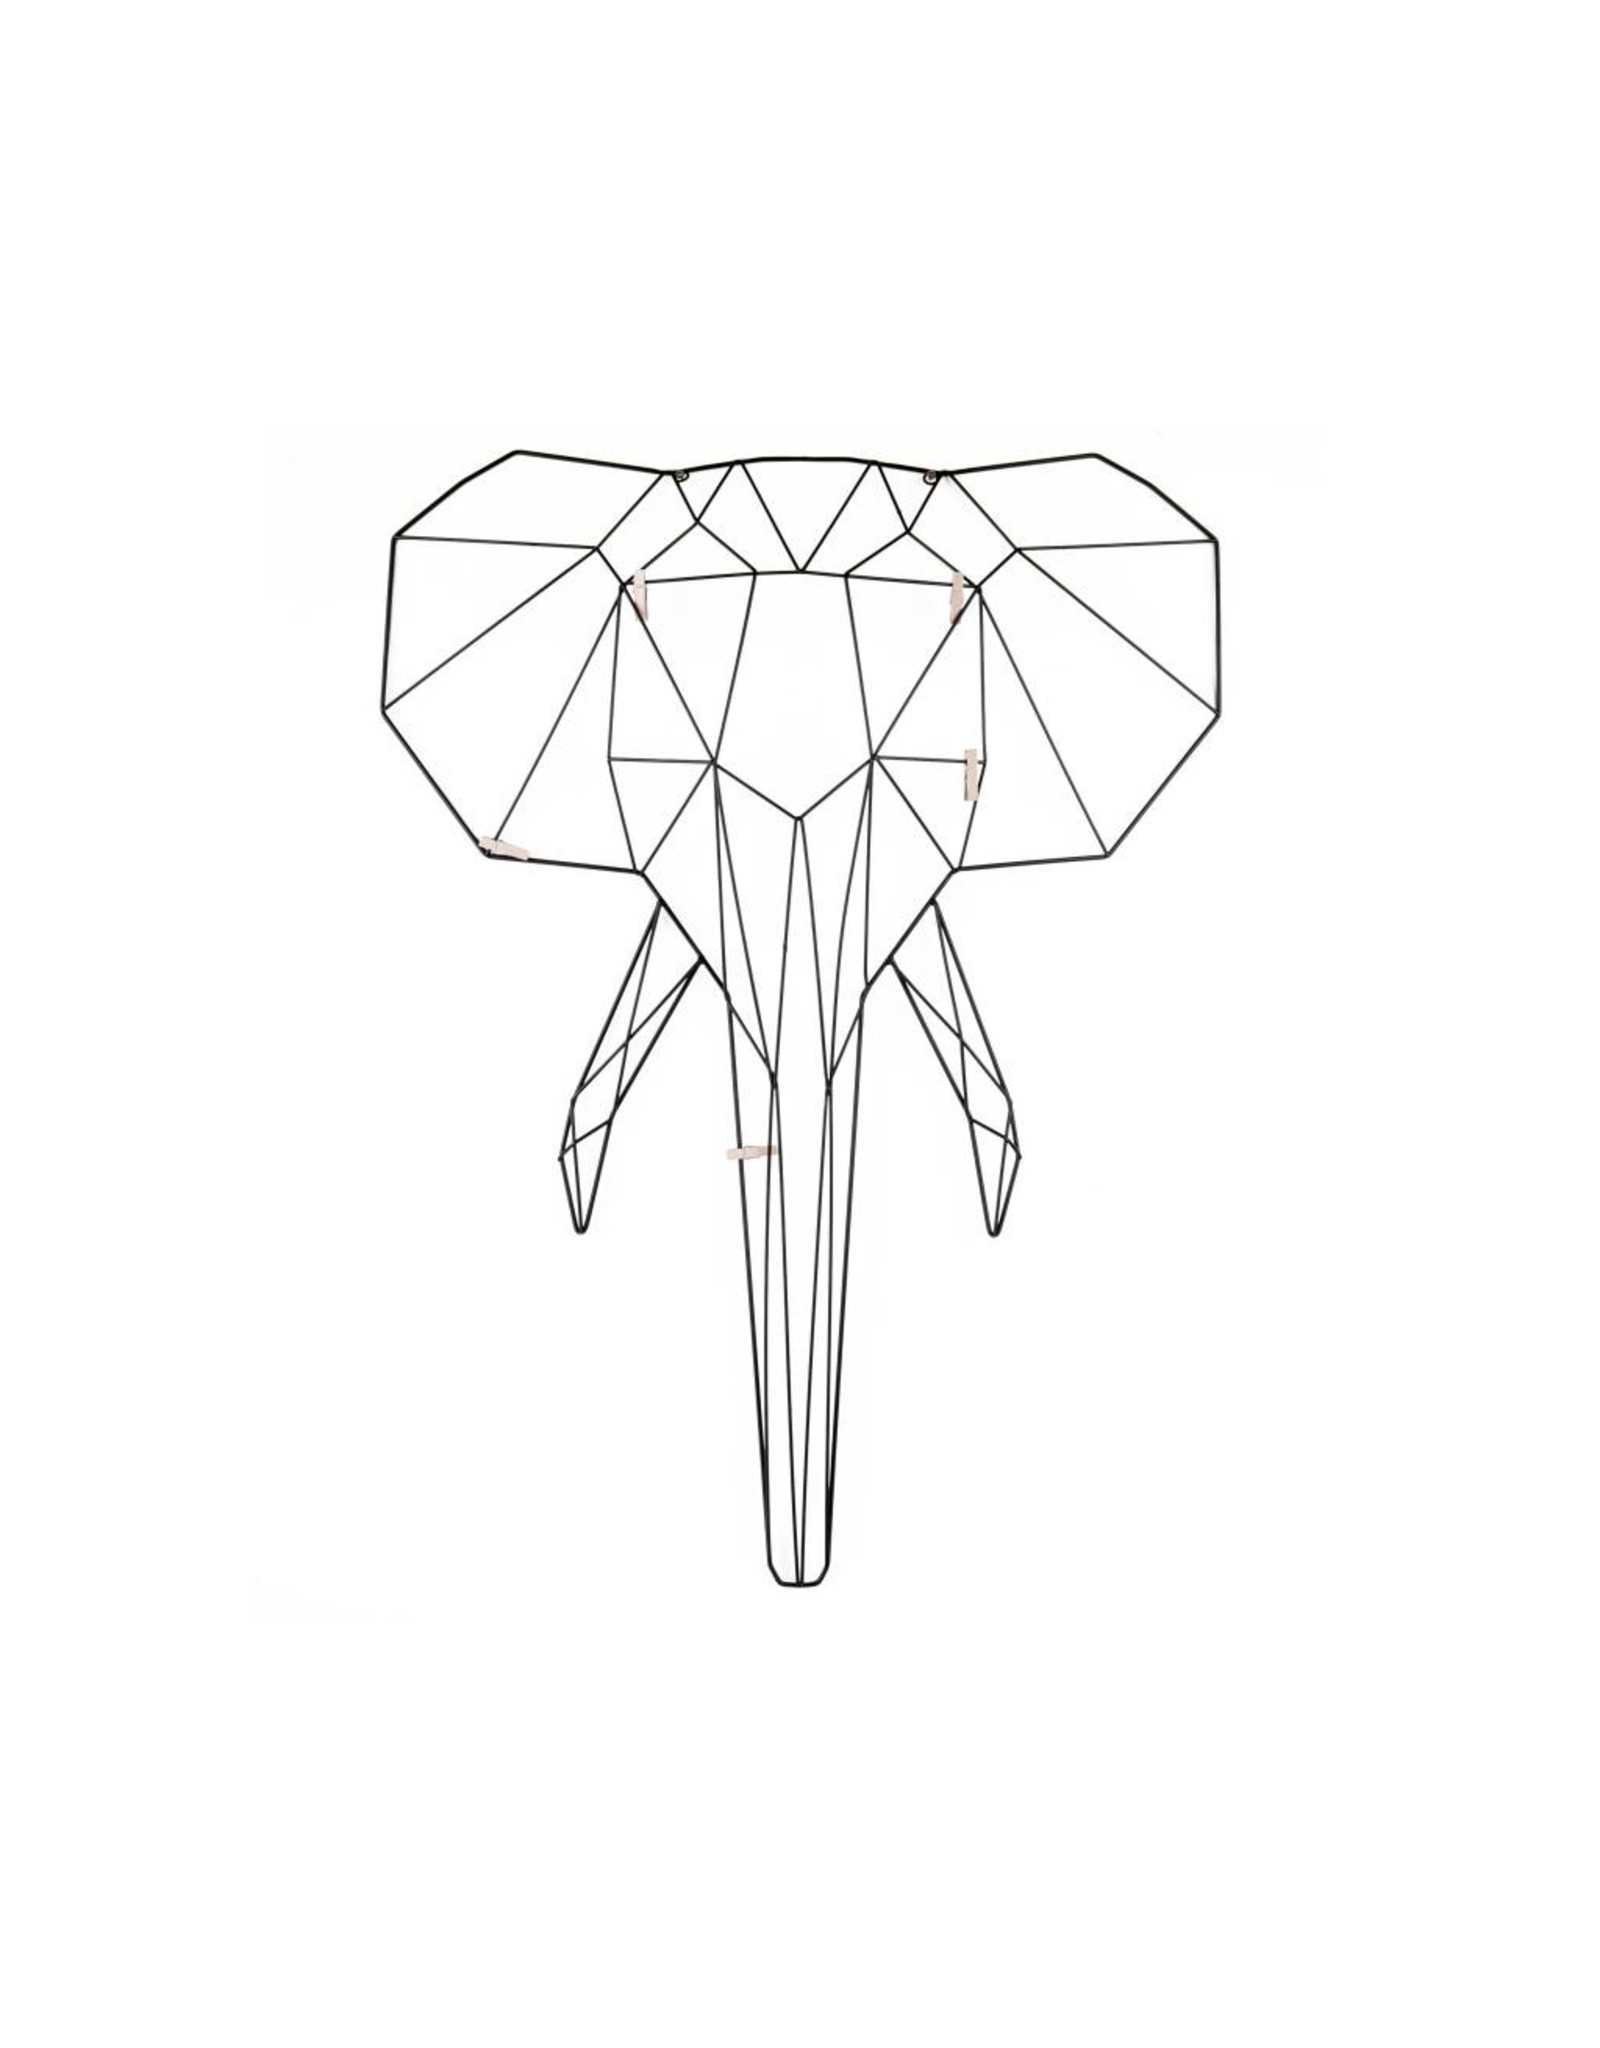 black metal memo rack in the shape of an elephant